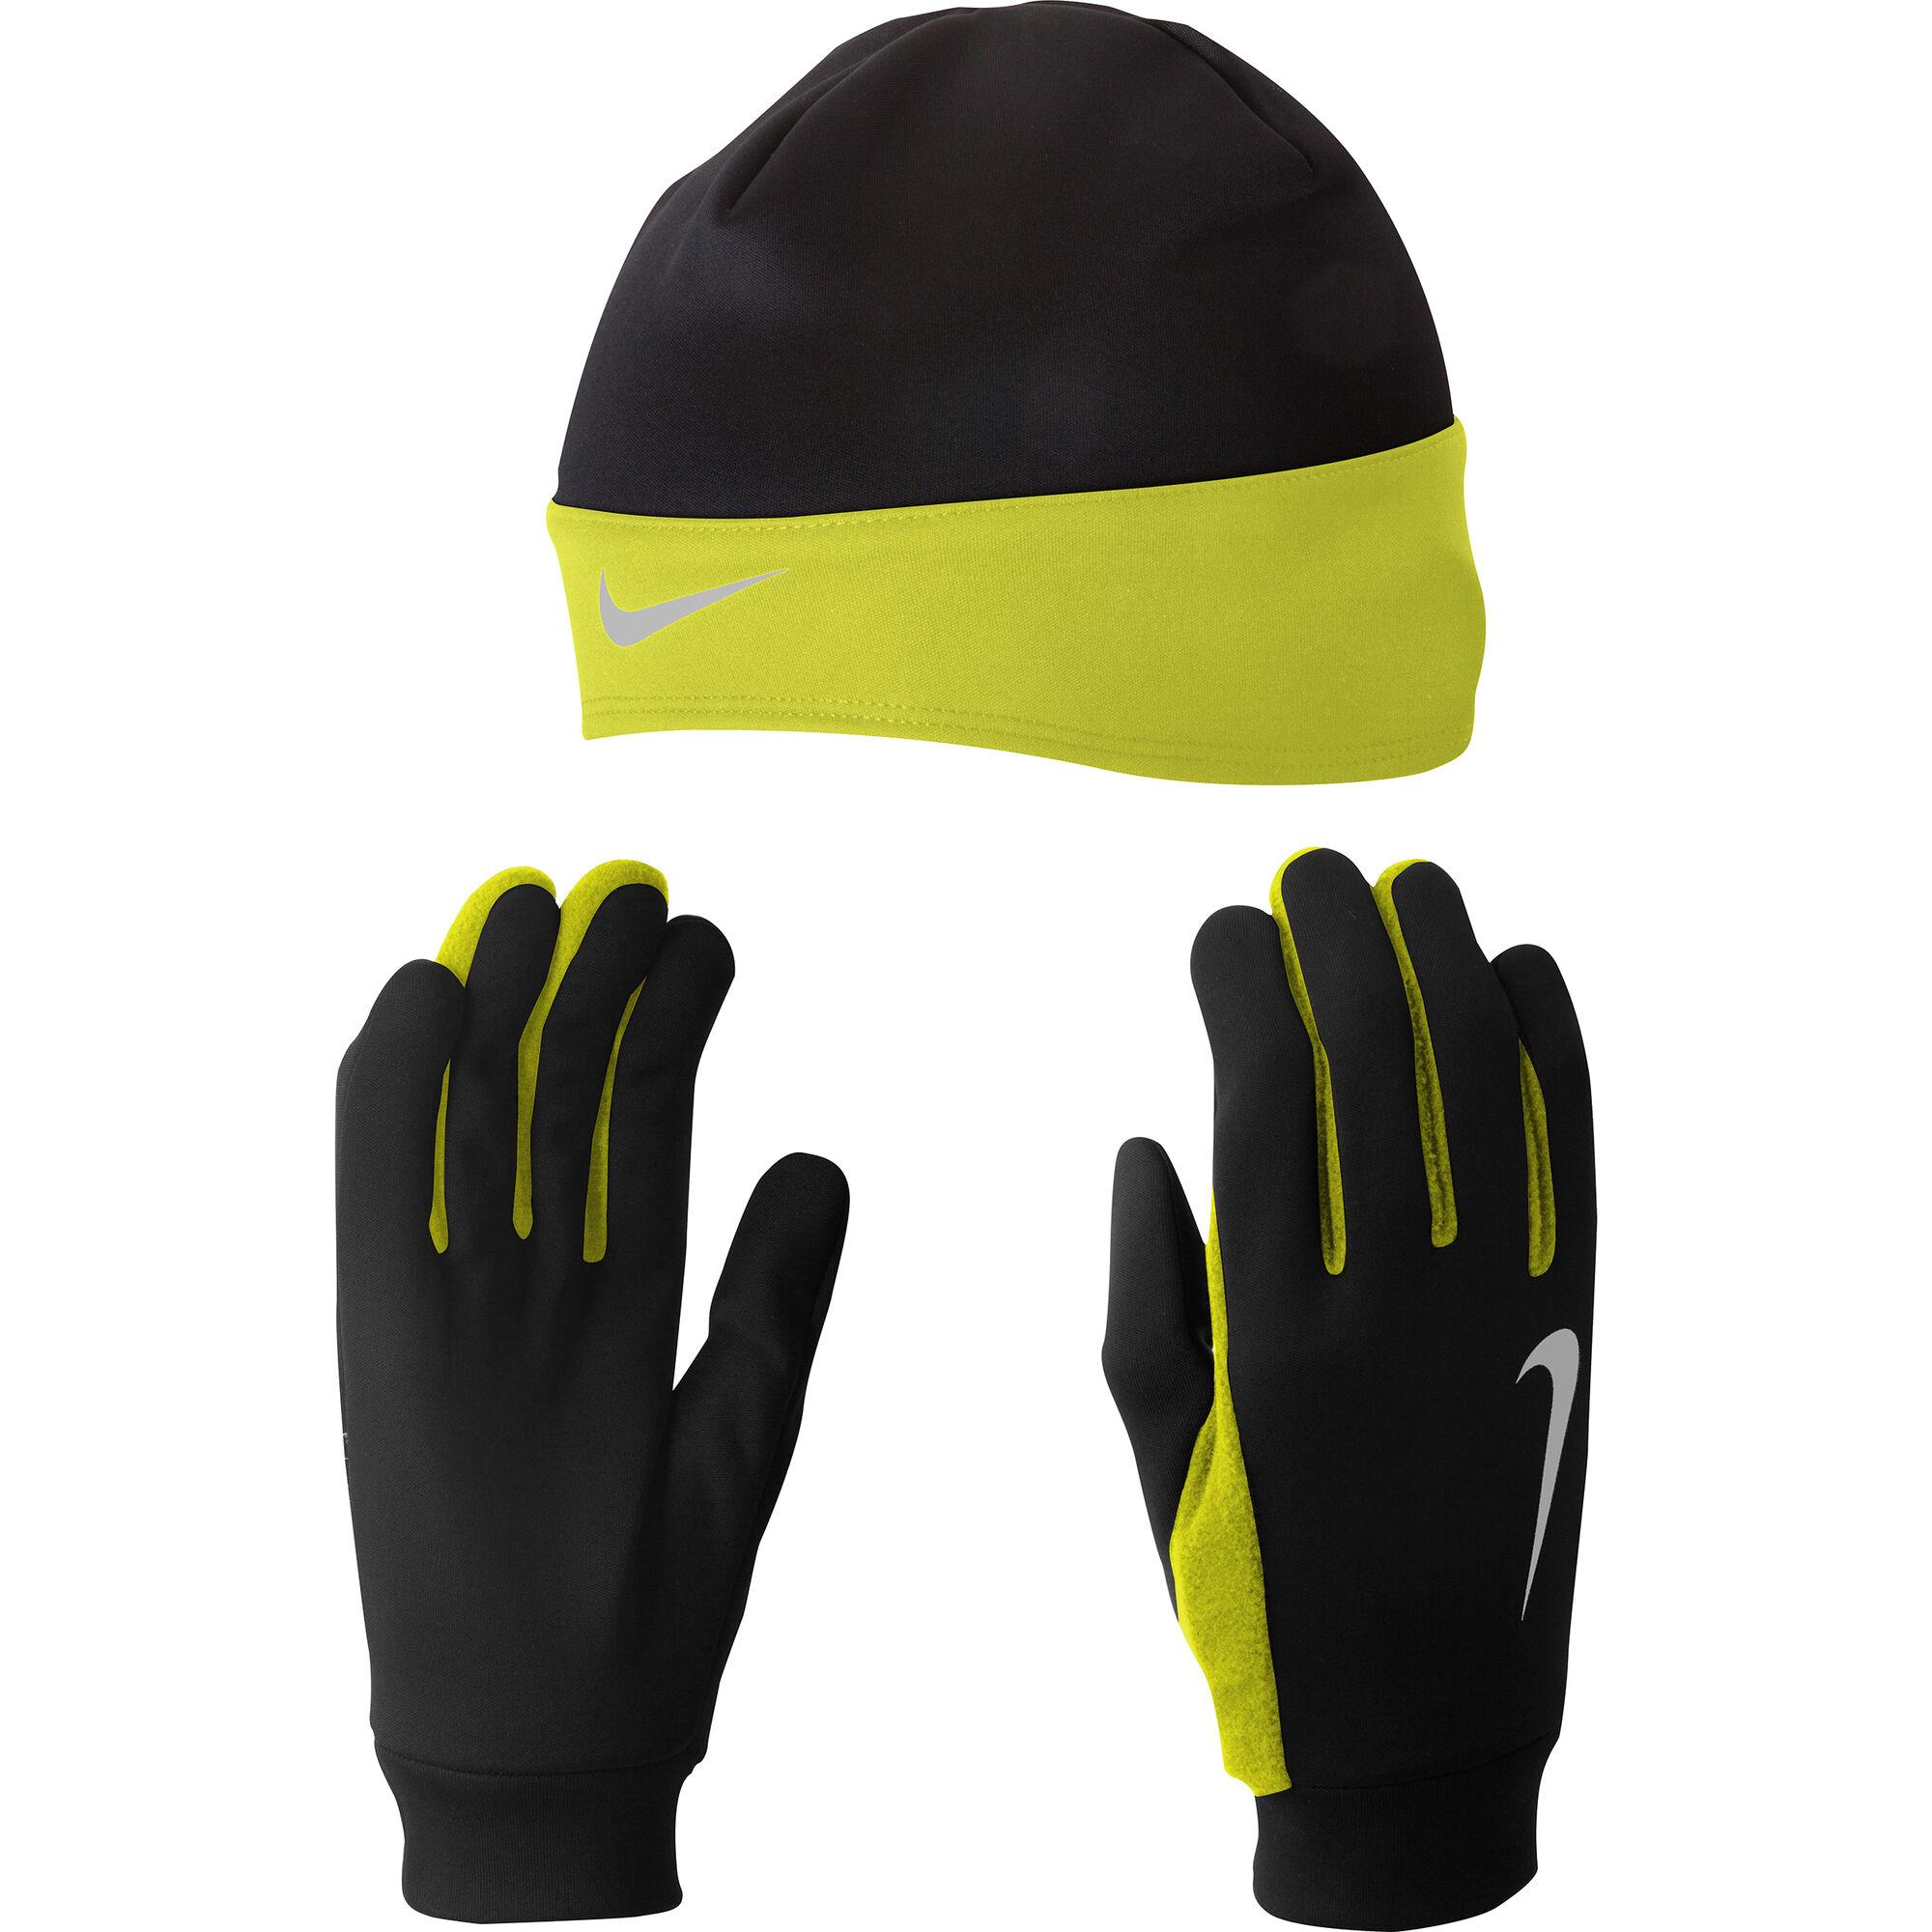 buy Nike Running Dri-Fit Glove Beanie Set Beanie Men - Black 37548a41b083